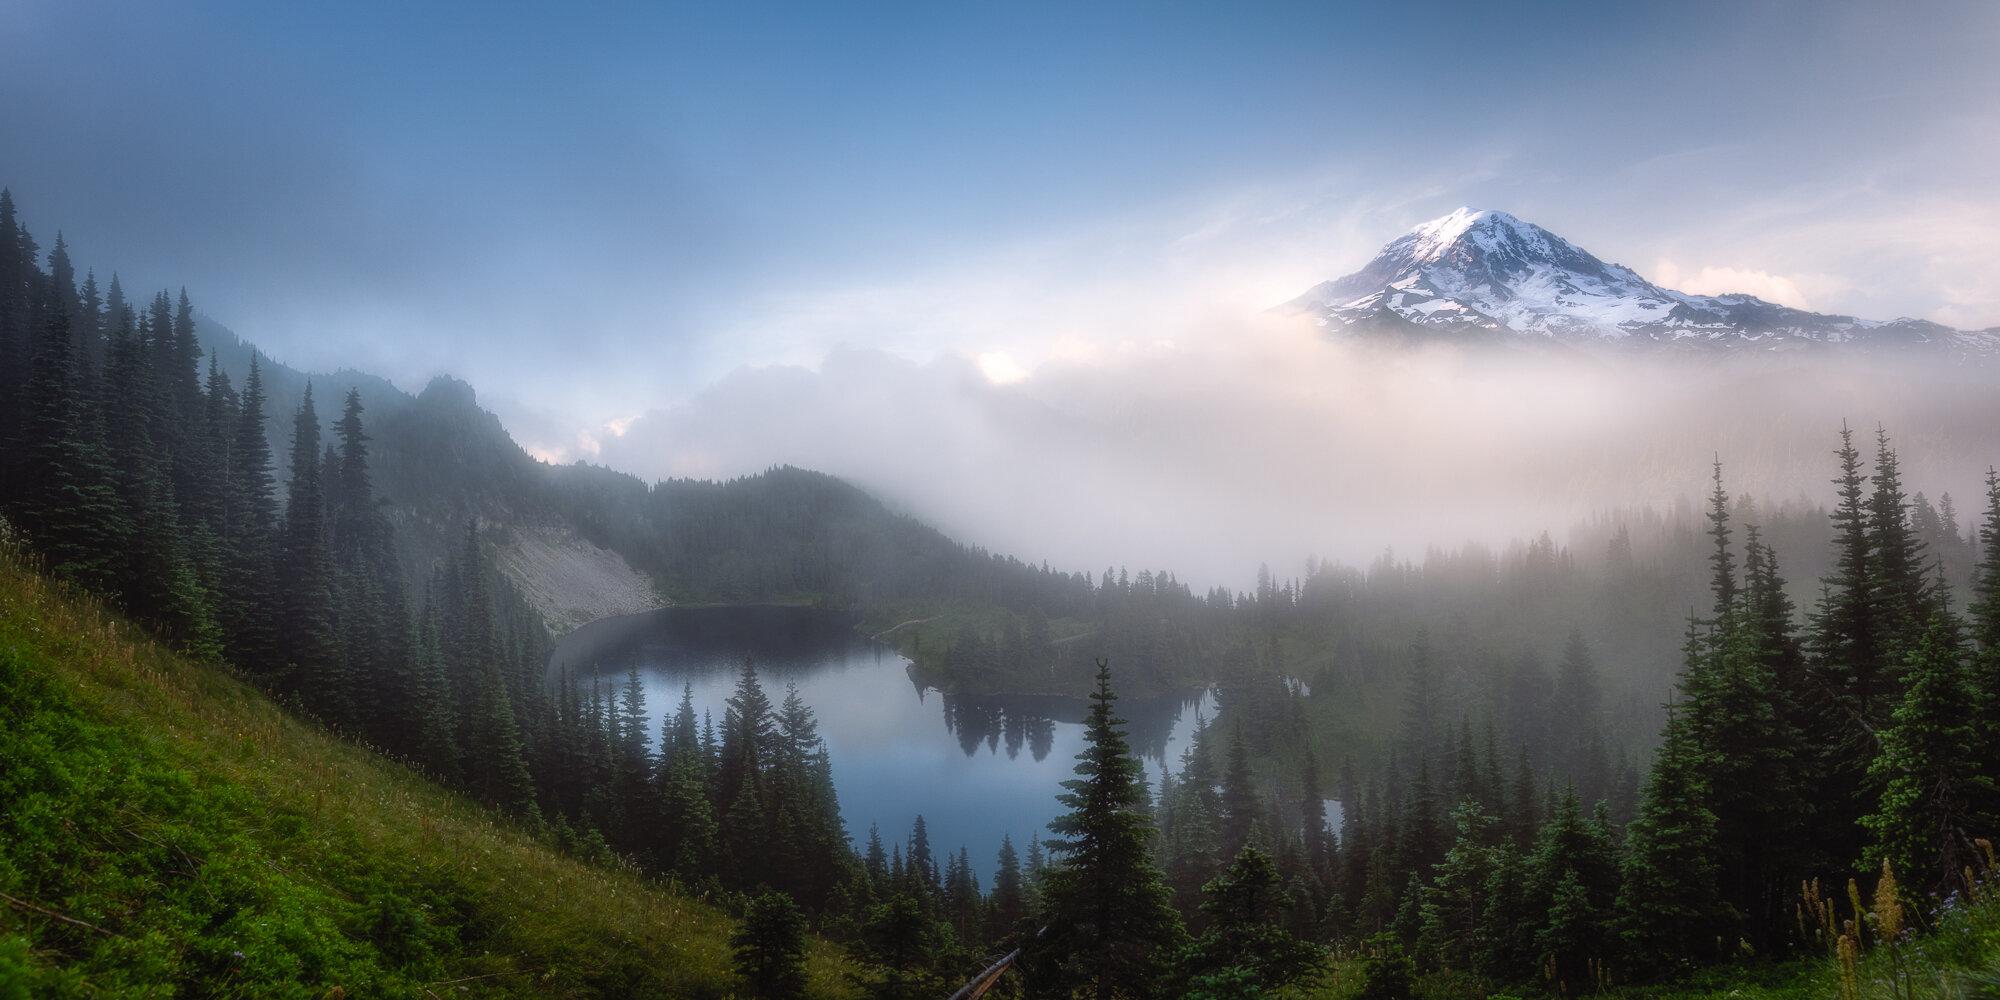 Mount Rainier Photography: 'Peaking Through Fog'